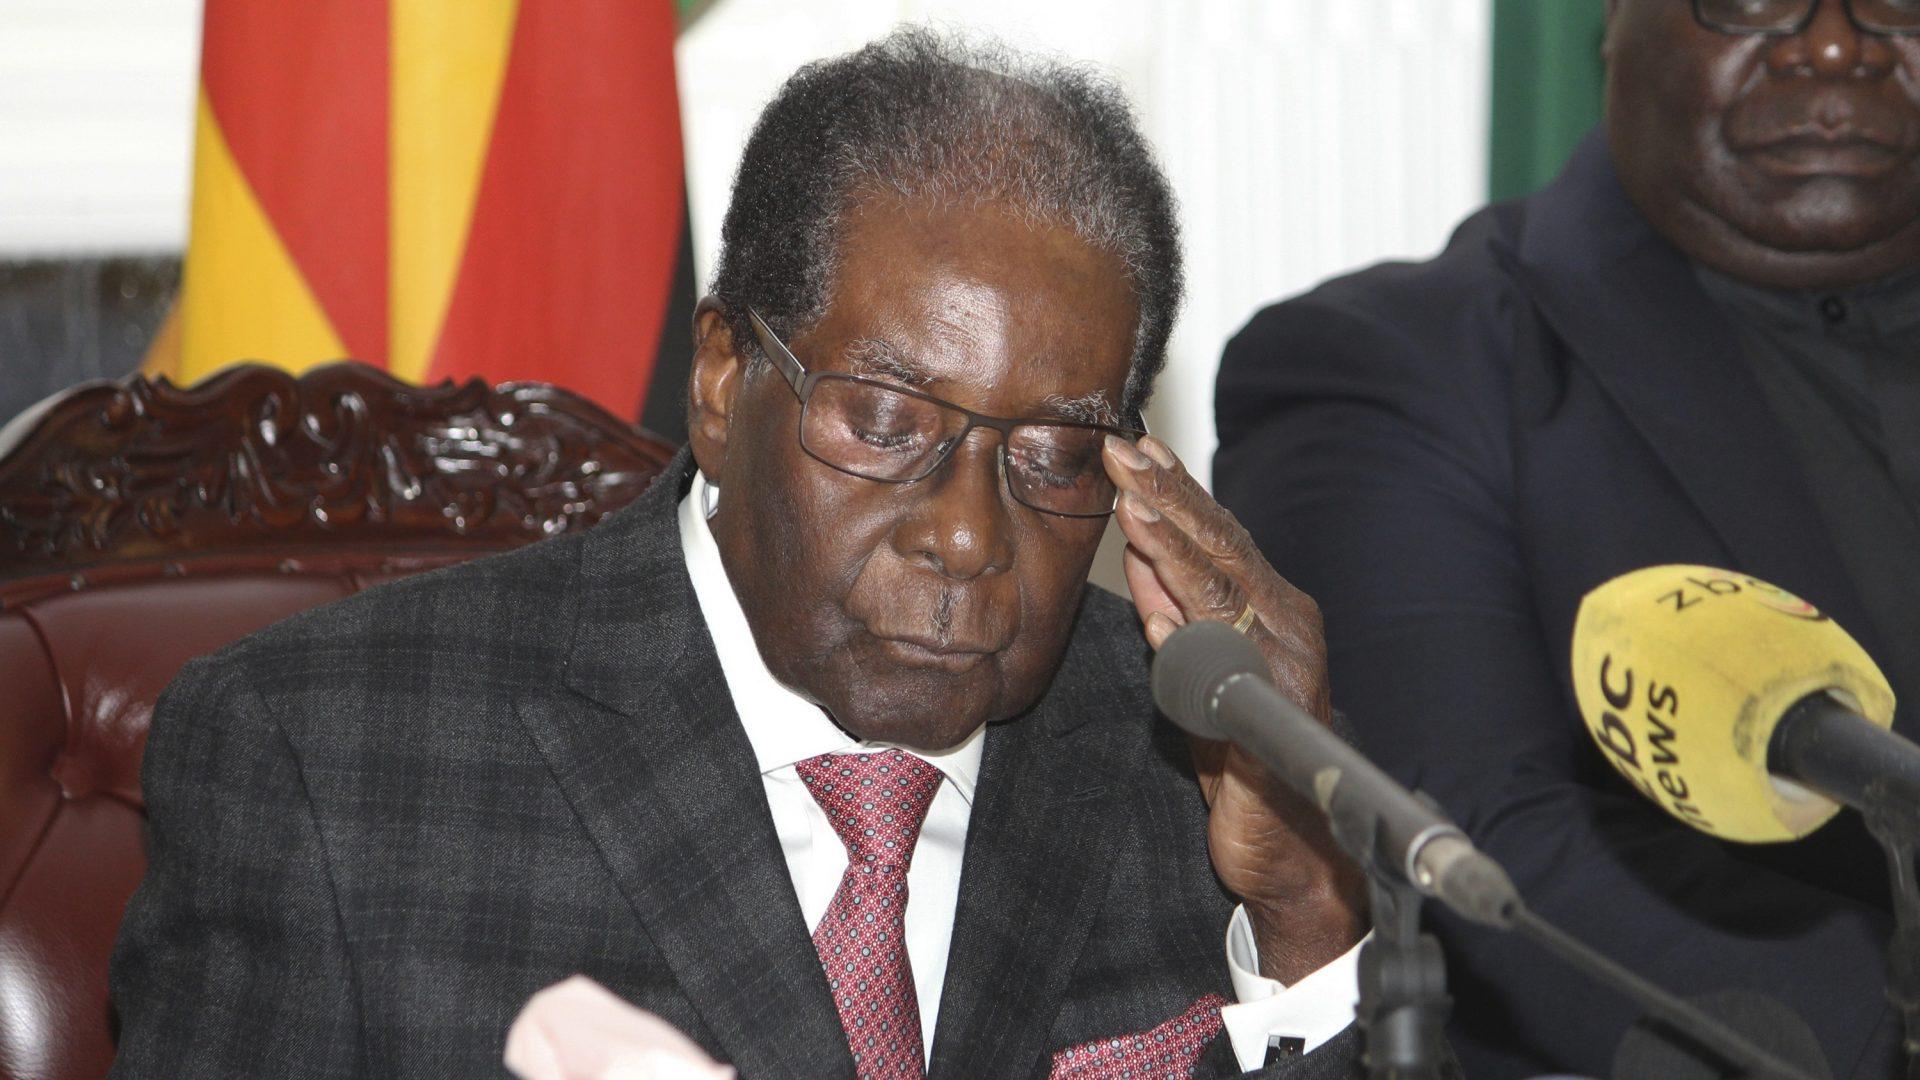 בילד: מוגאבי רעזיגנירט נאך 37 יאר אויפ'ן אמט אין זימבאבווע